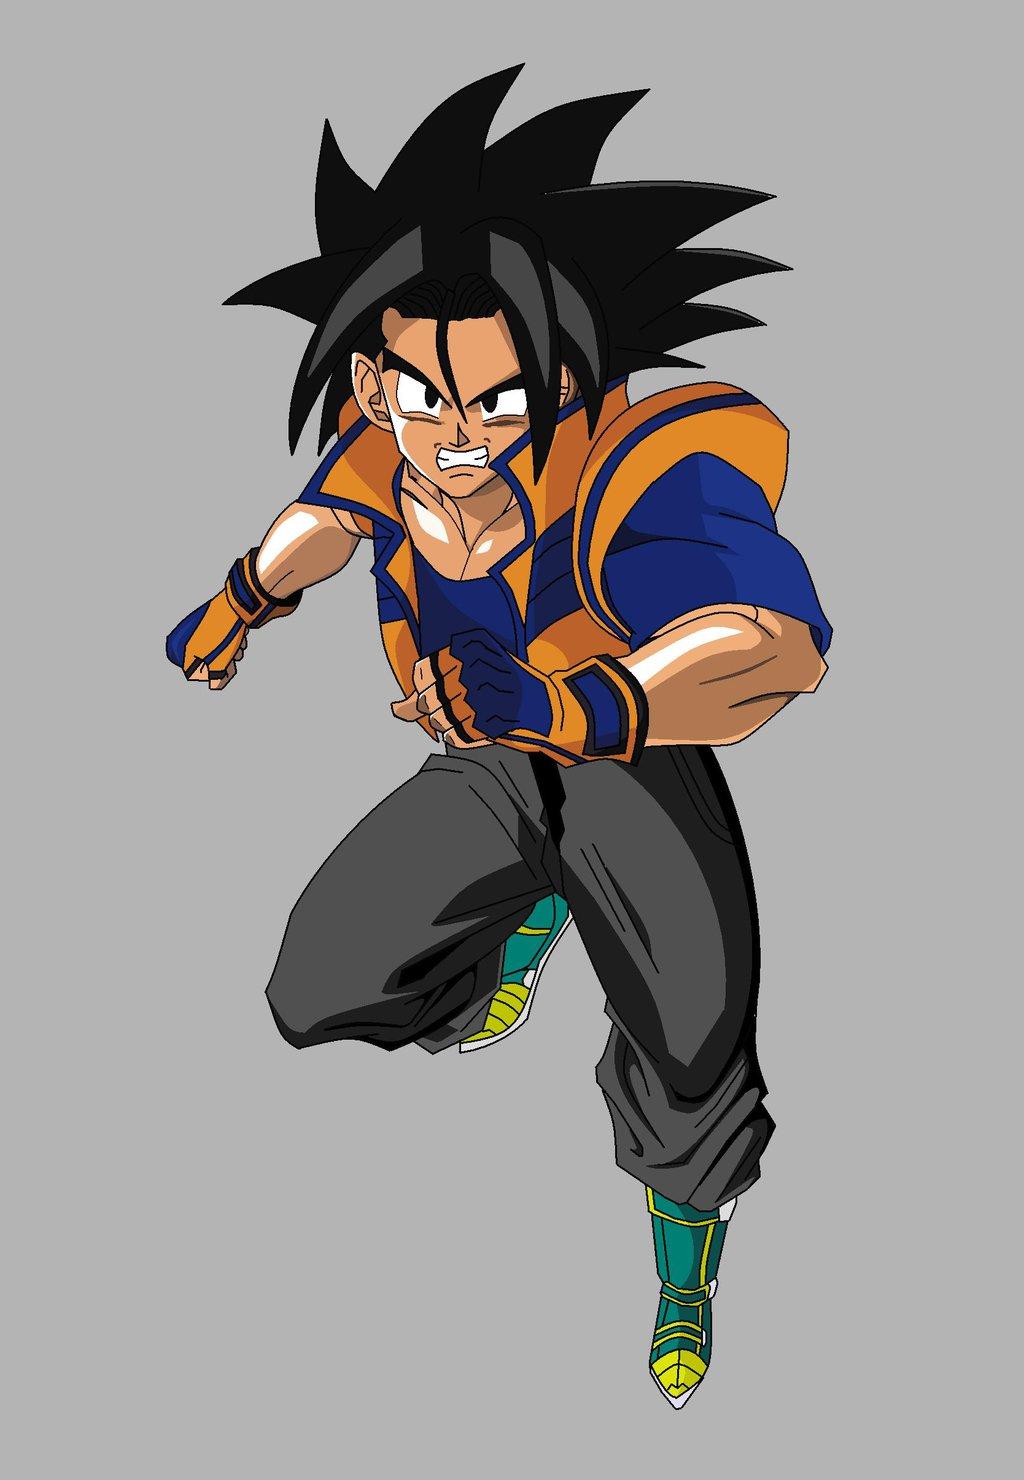 Goken Finale   Dragonball Fanon Wiki   FANDOM powered by Wikia Dragon Ball Z Characters Goku Drawing